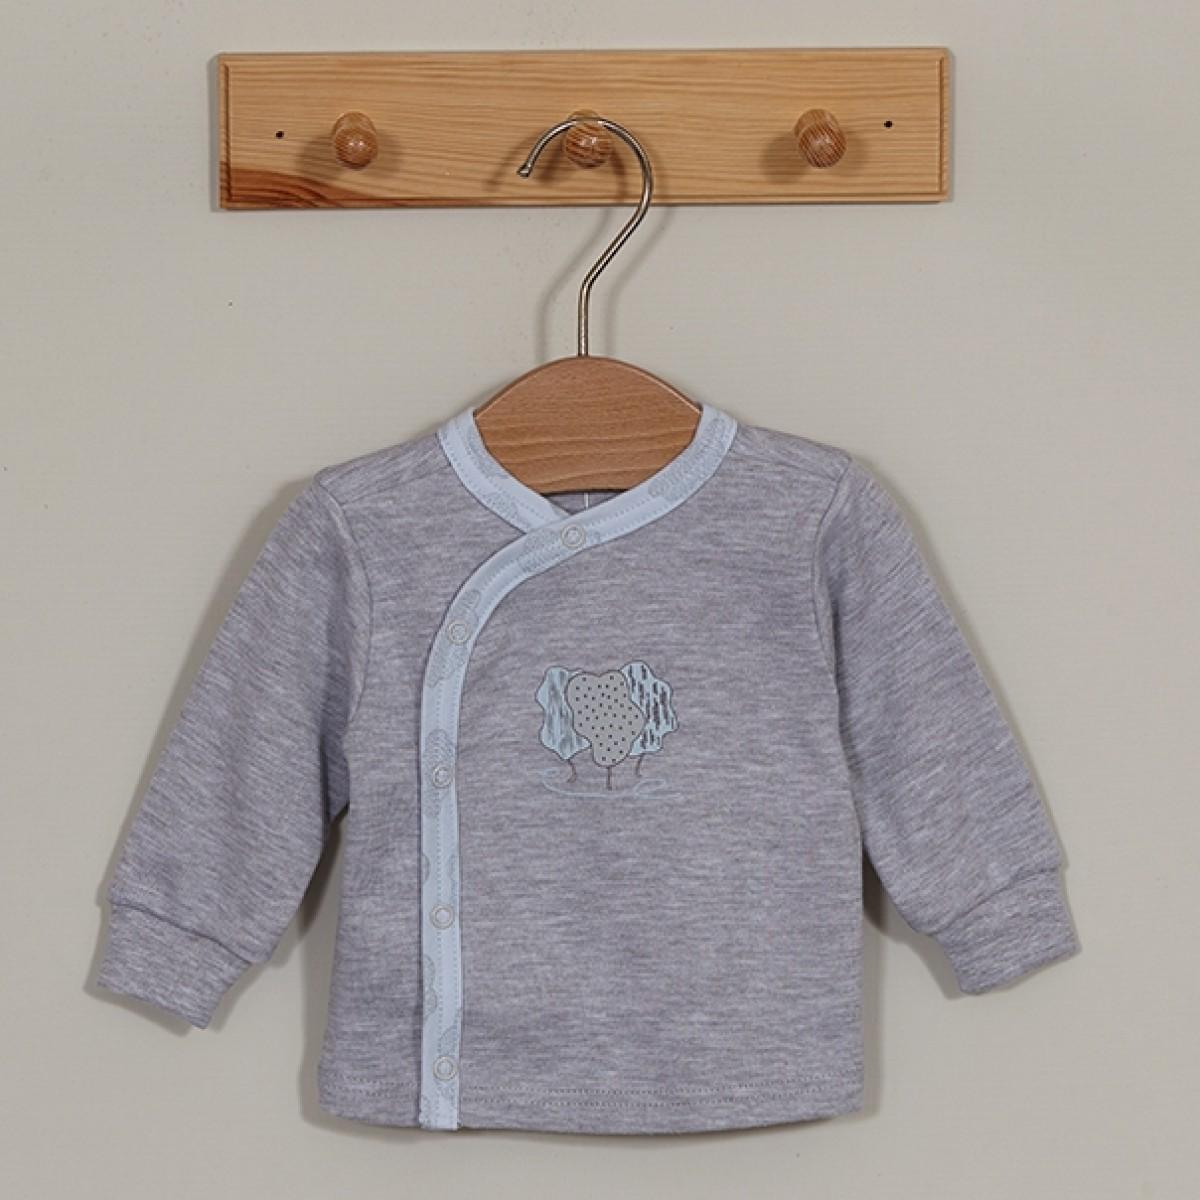 Marškinėliai VILAURITA Klaudio, 62 cm (823)